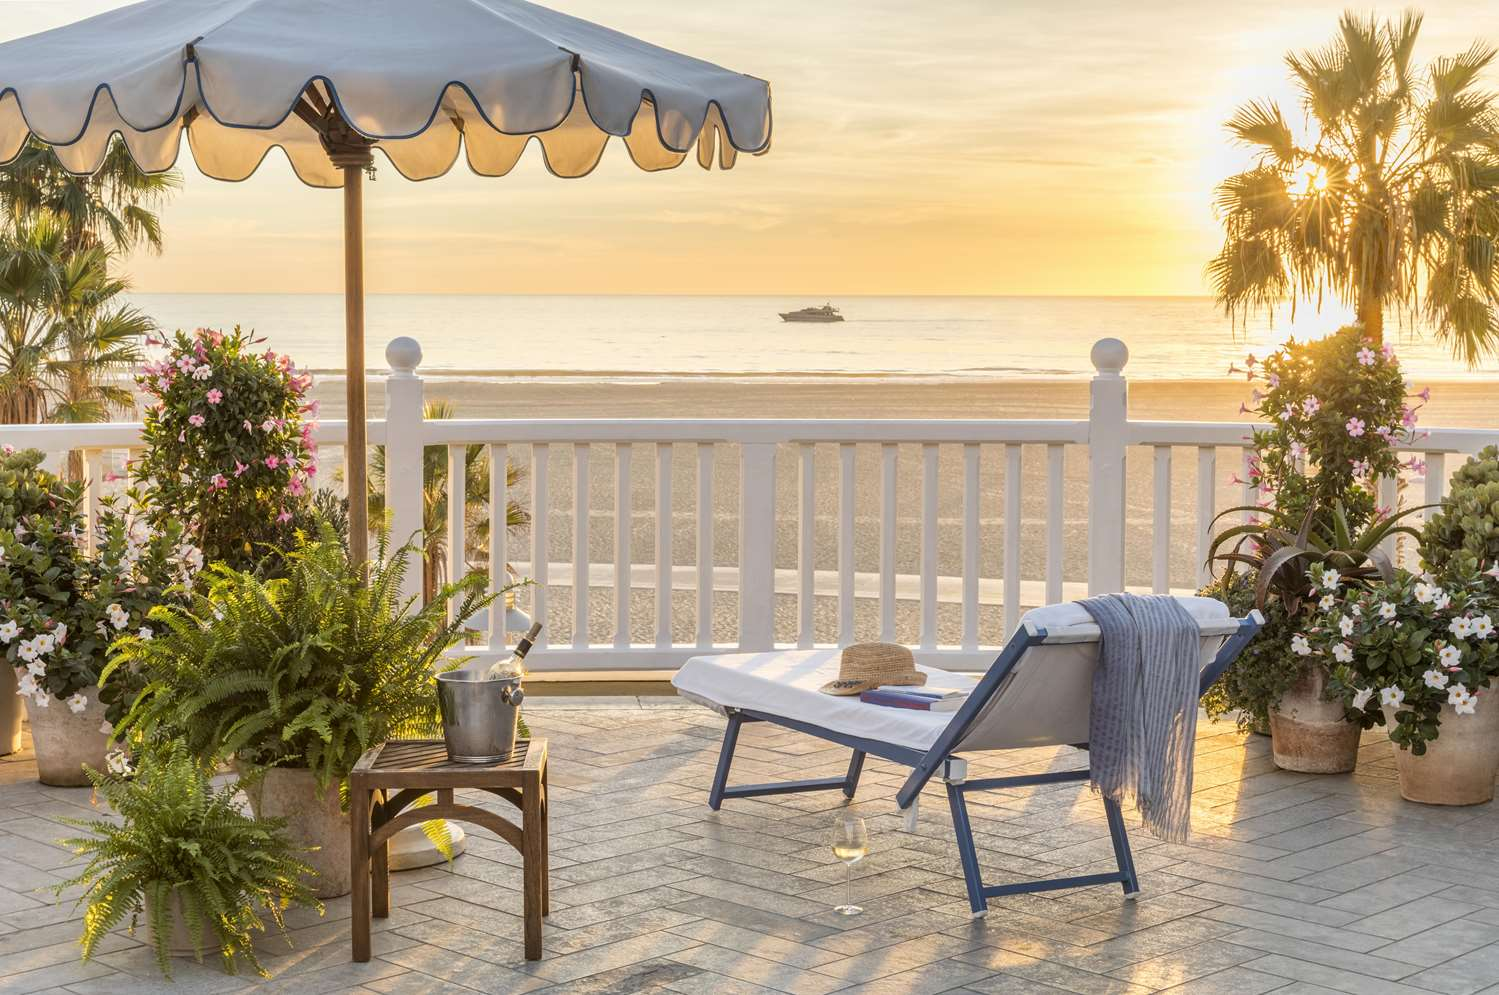 proam - Shutters on the Beach Hotel Santa Monica